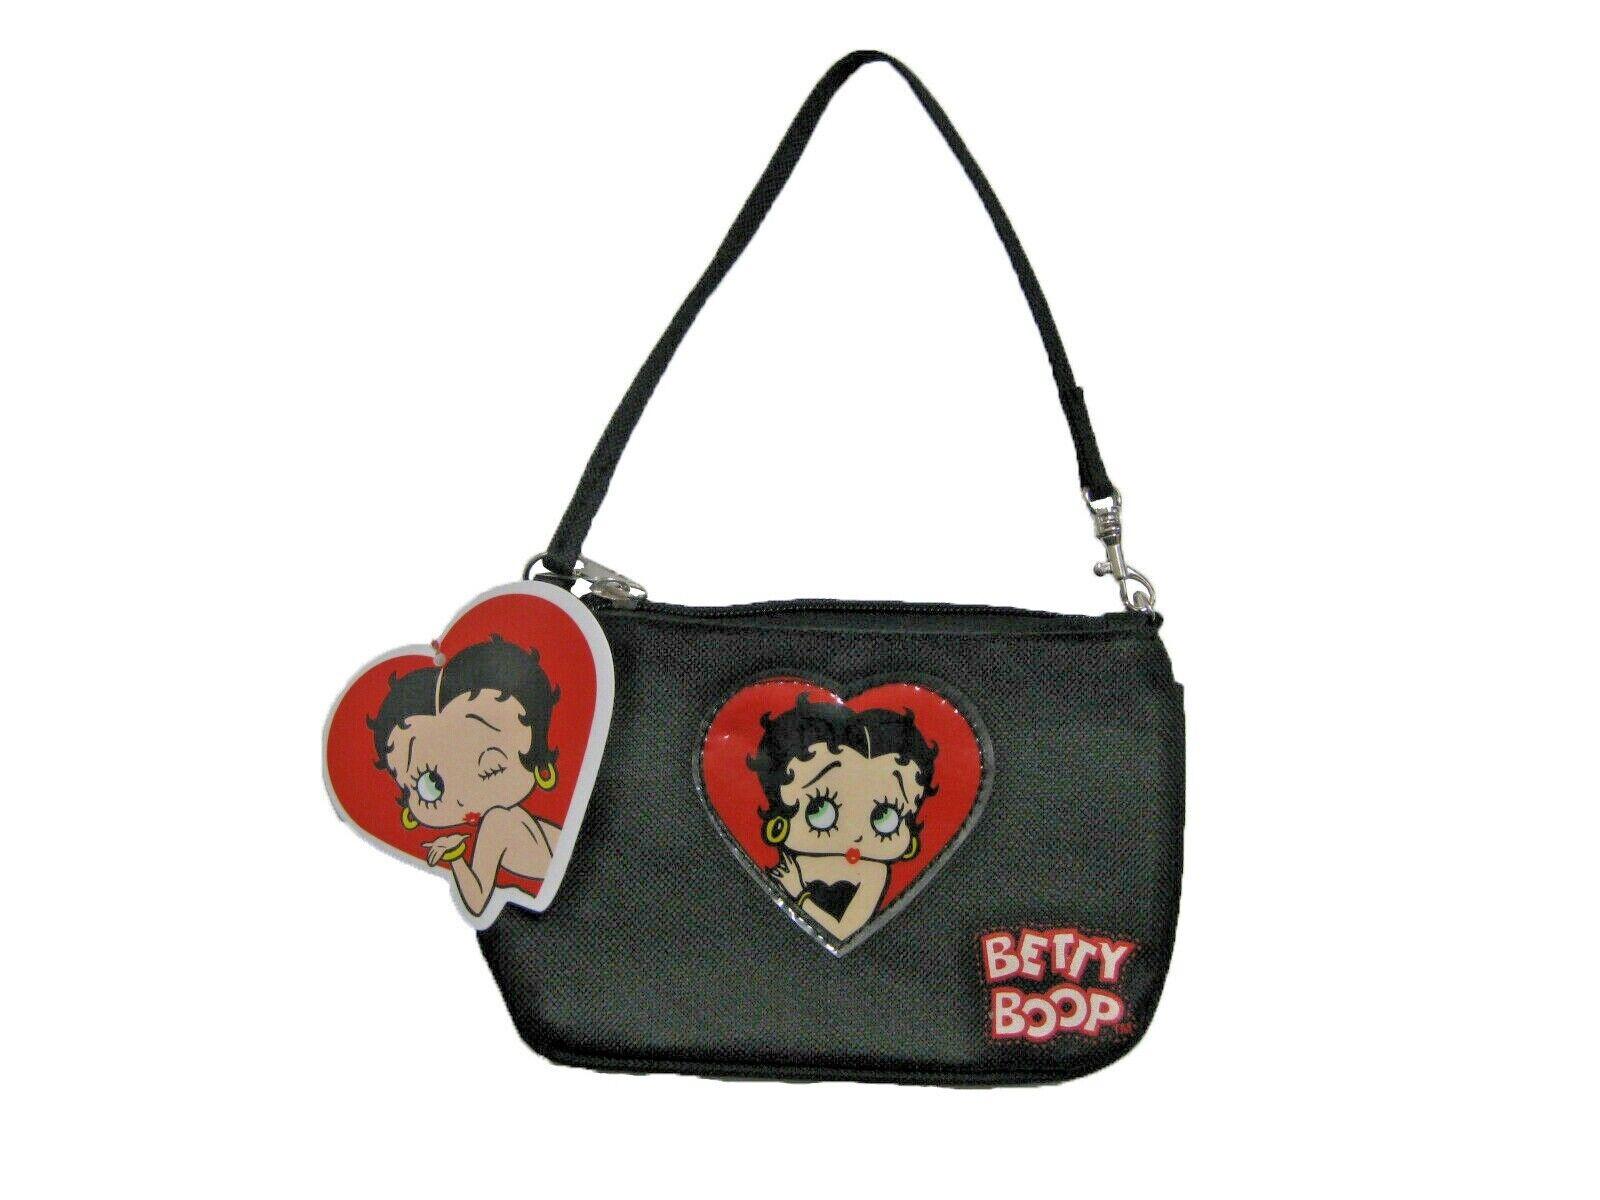 Betty Boop Handbag Omni For